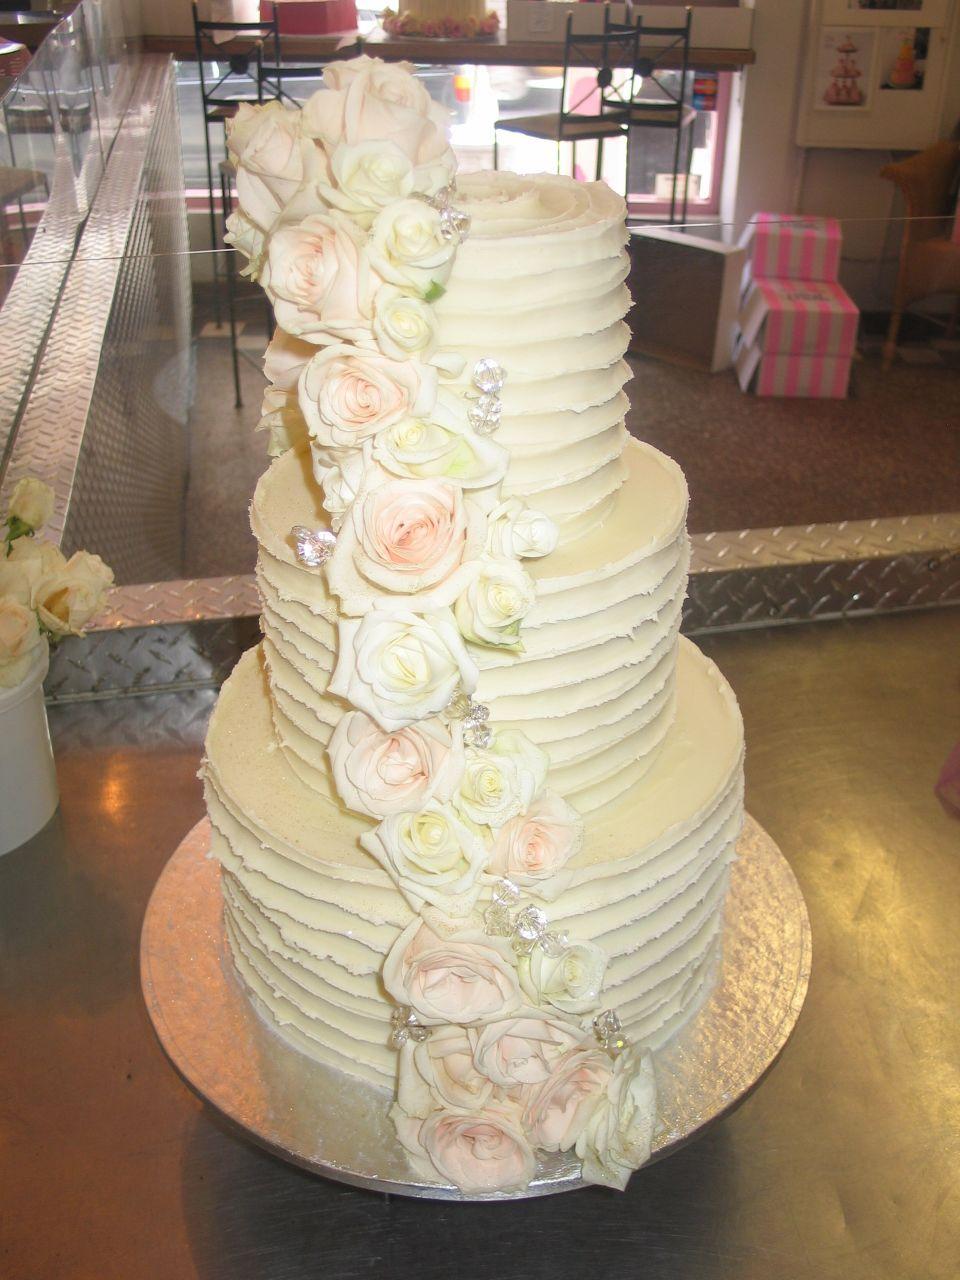 3 tier white chocolate wedding cake with white & cream roses ...